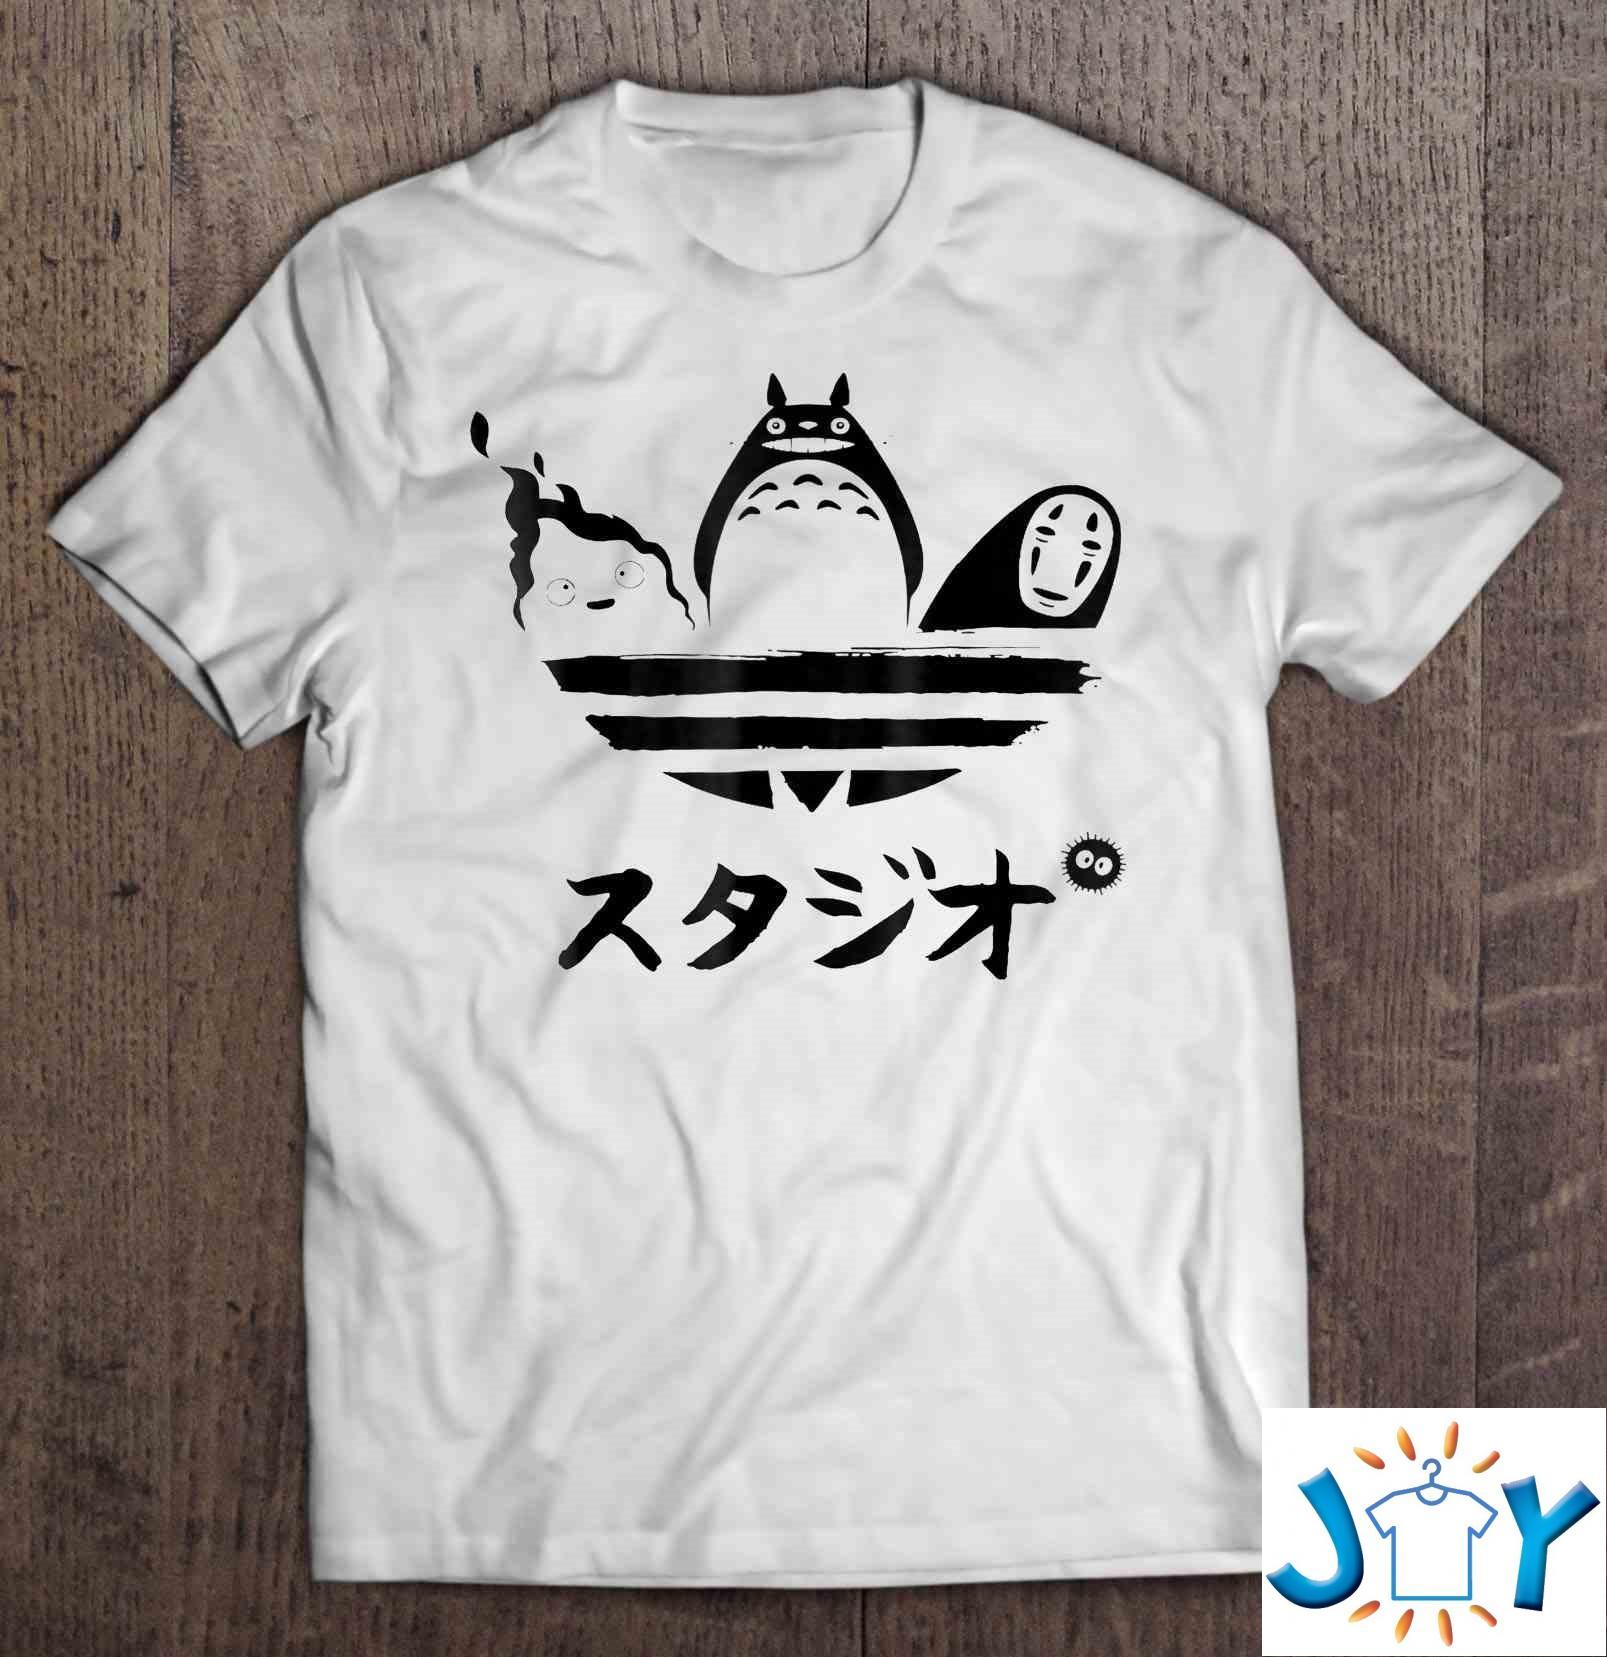 Studio Ghibli Adidas Classic T-Shirt